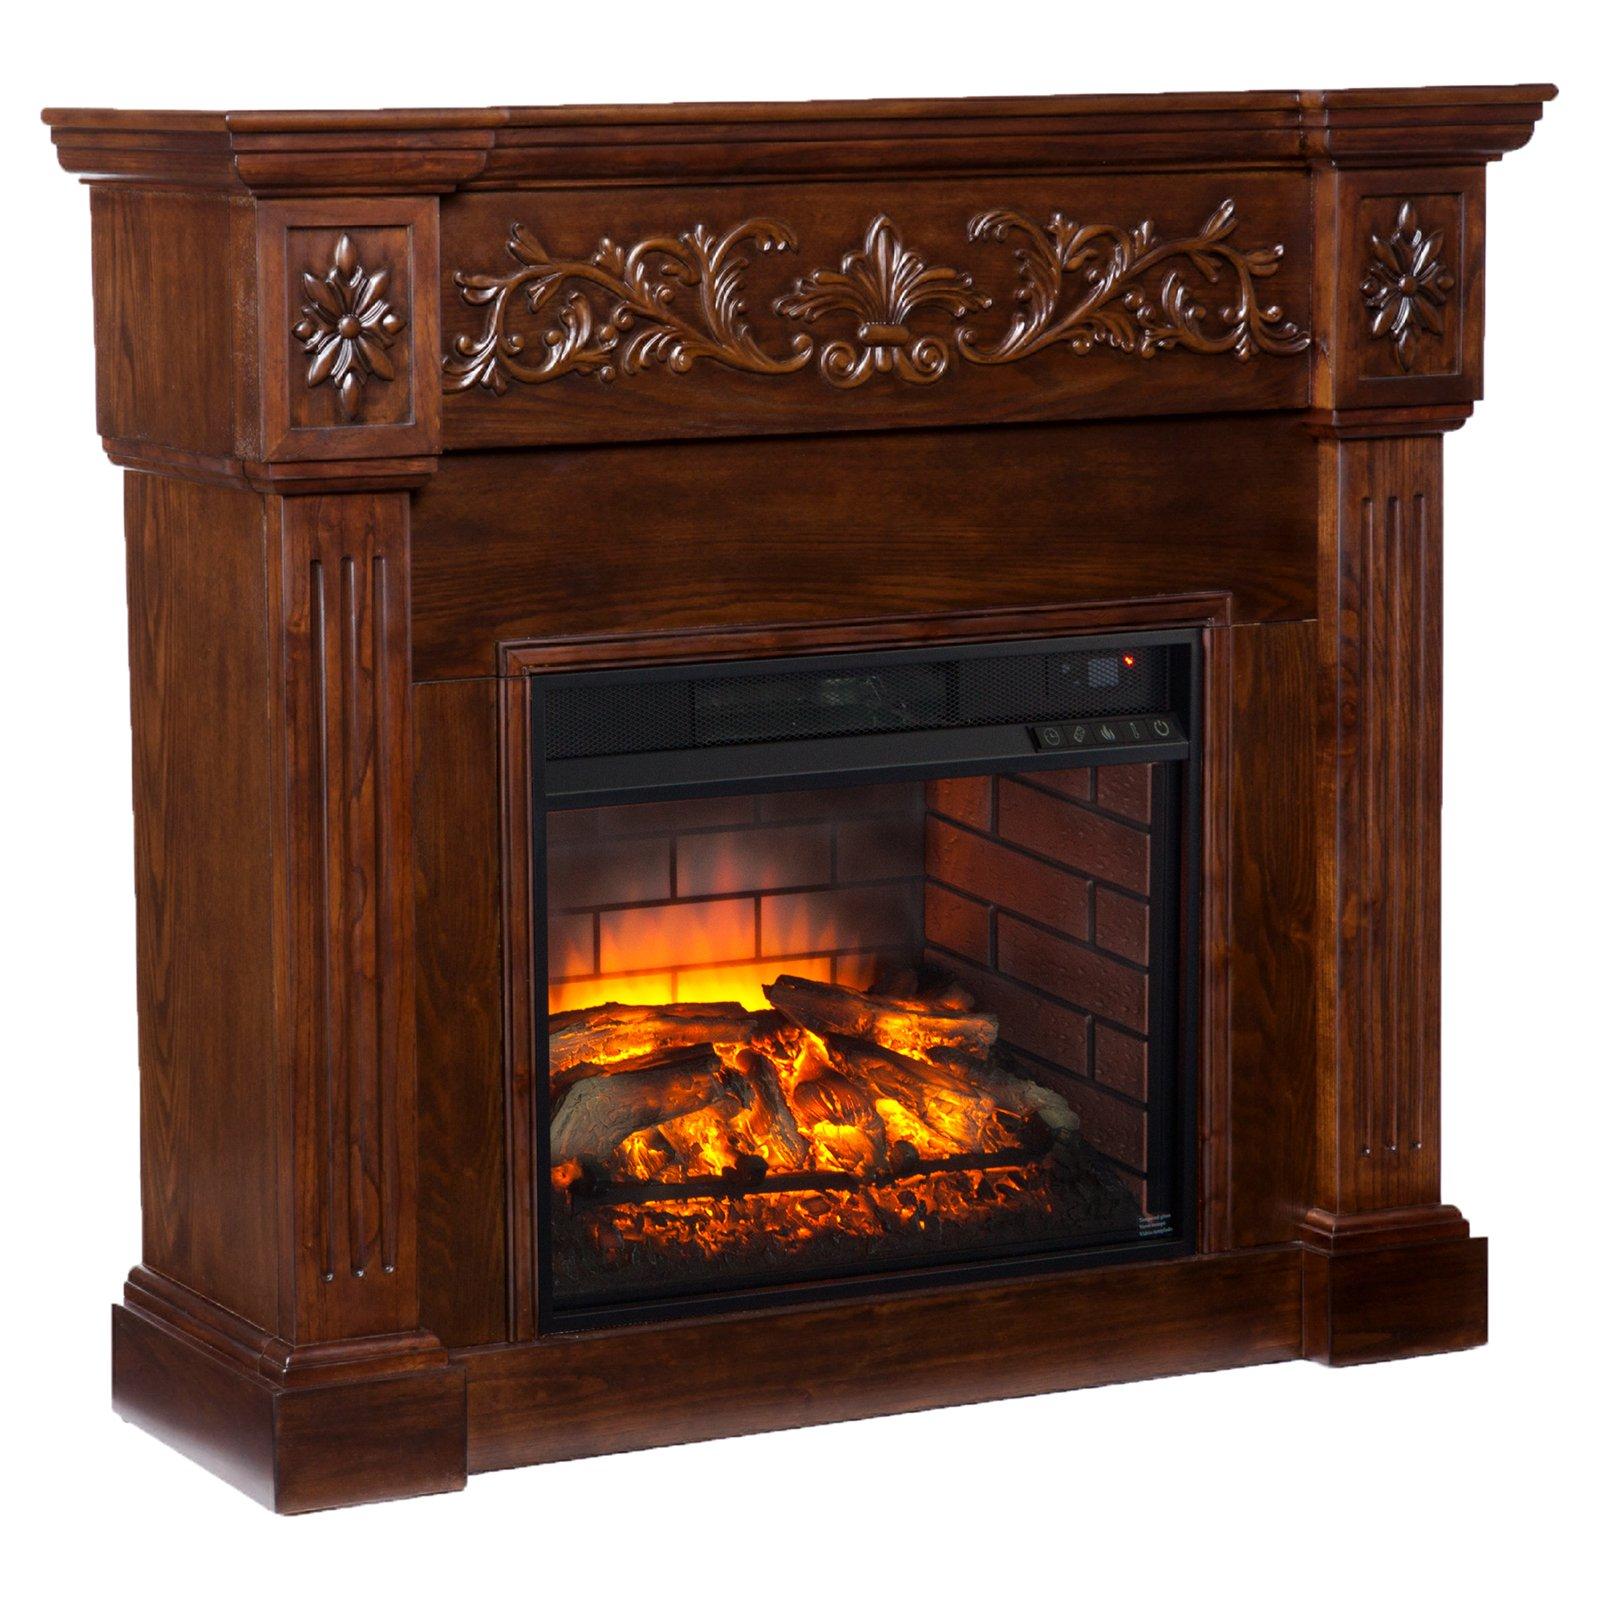 Southern Enterprises Calvert Carved Infrared Electric Fireplace by Southern Enterprises